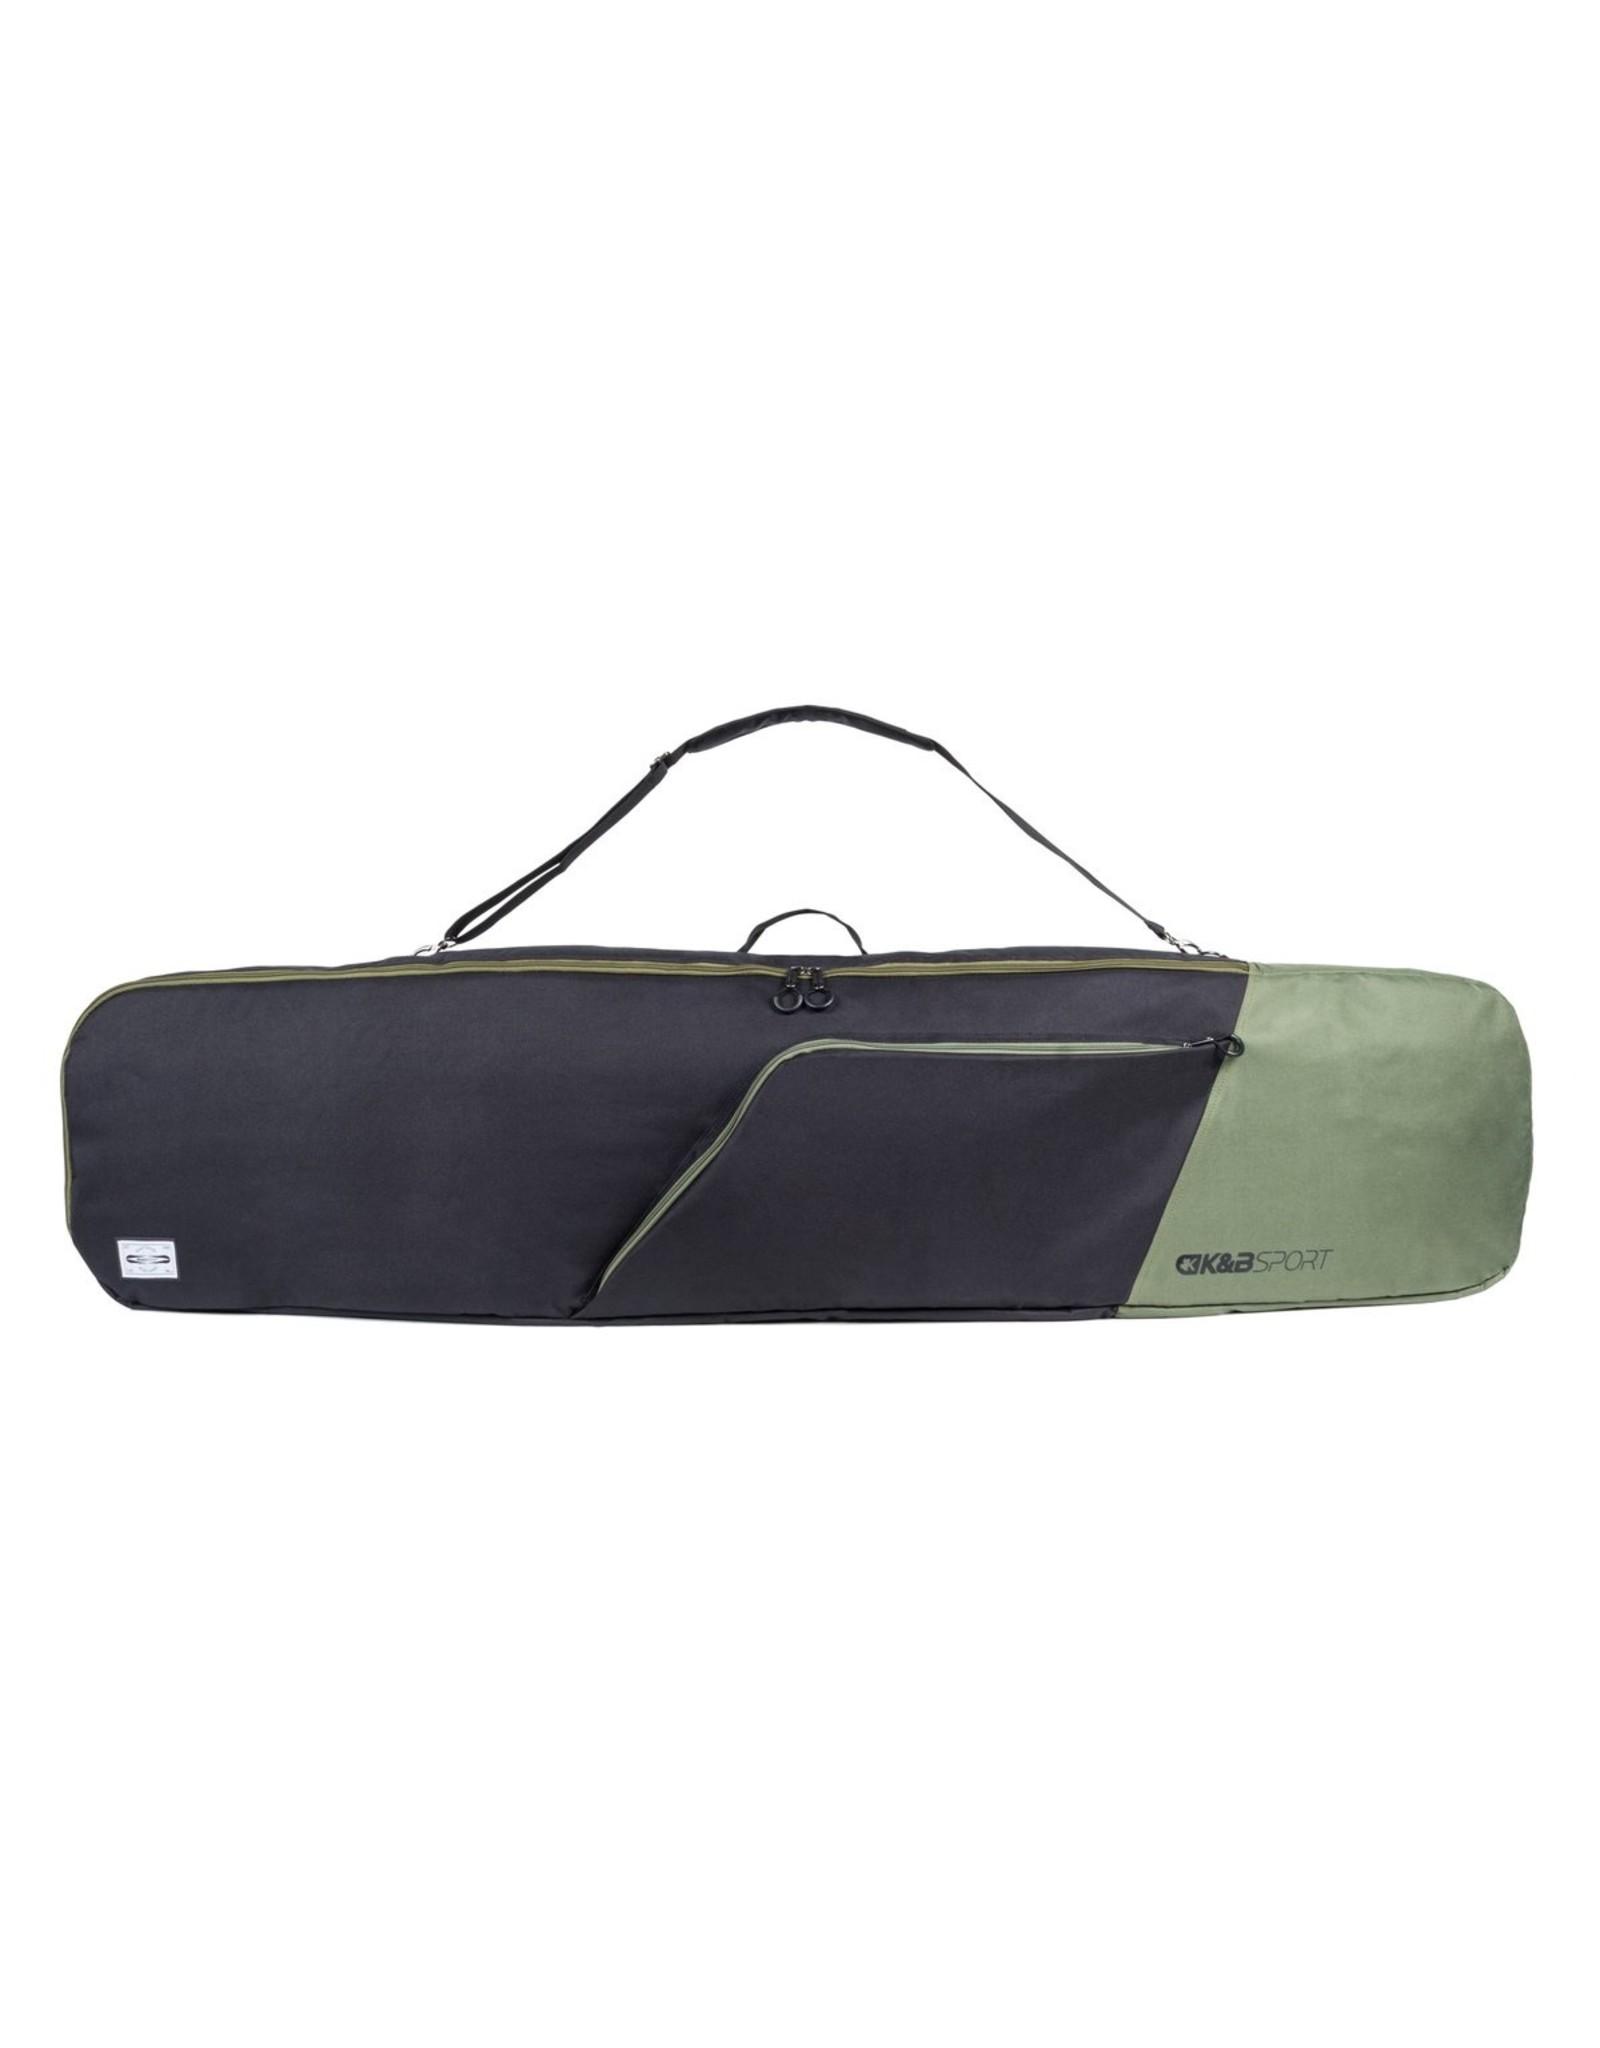 K&B Snowboard Bag Long